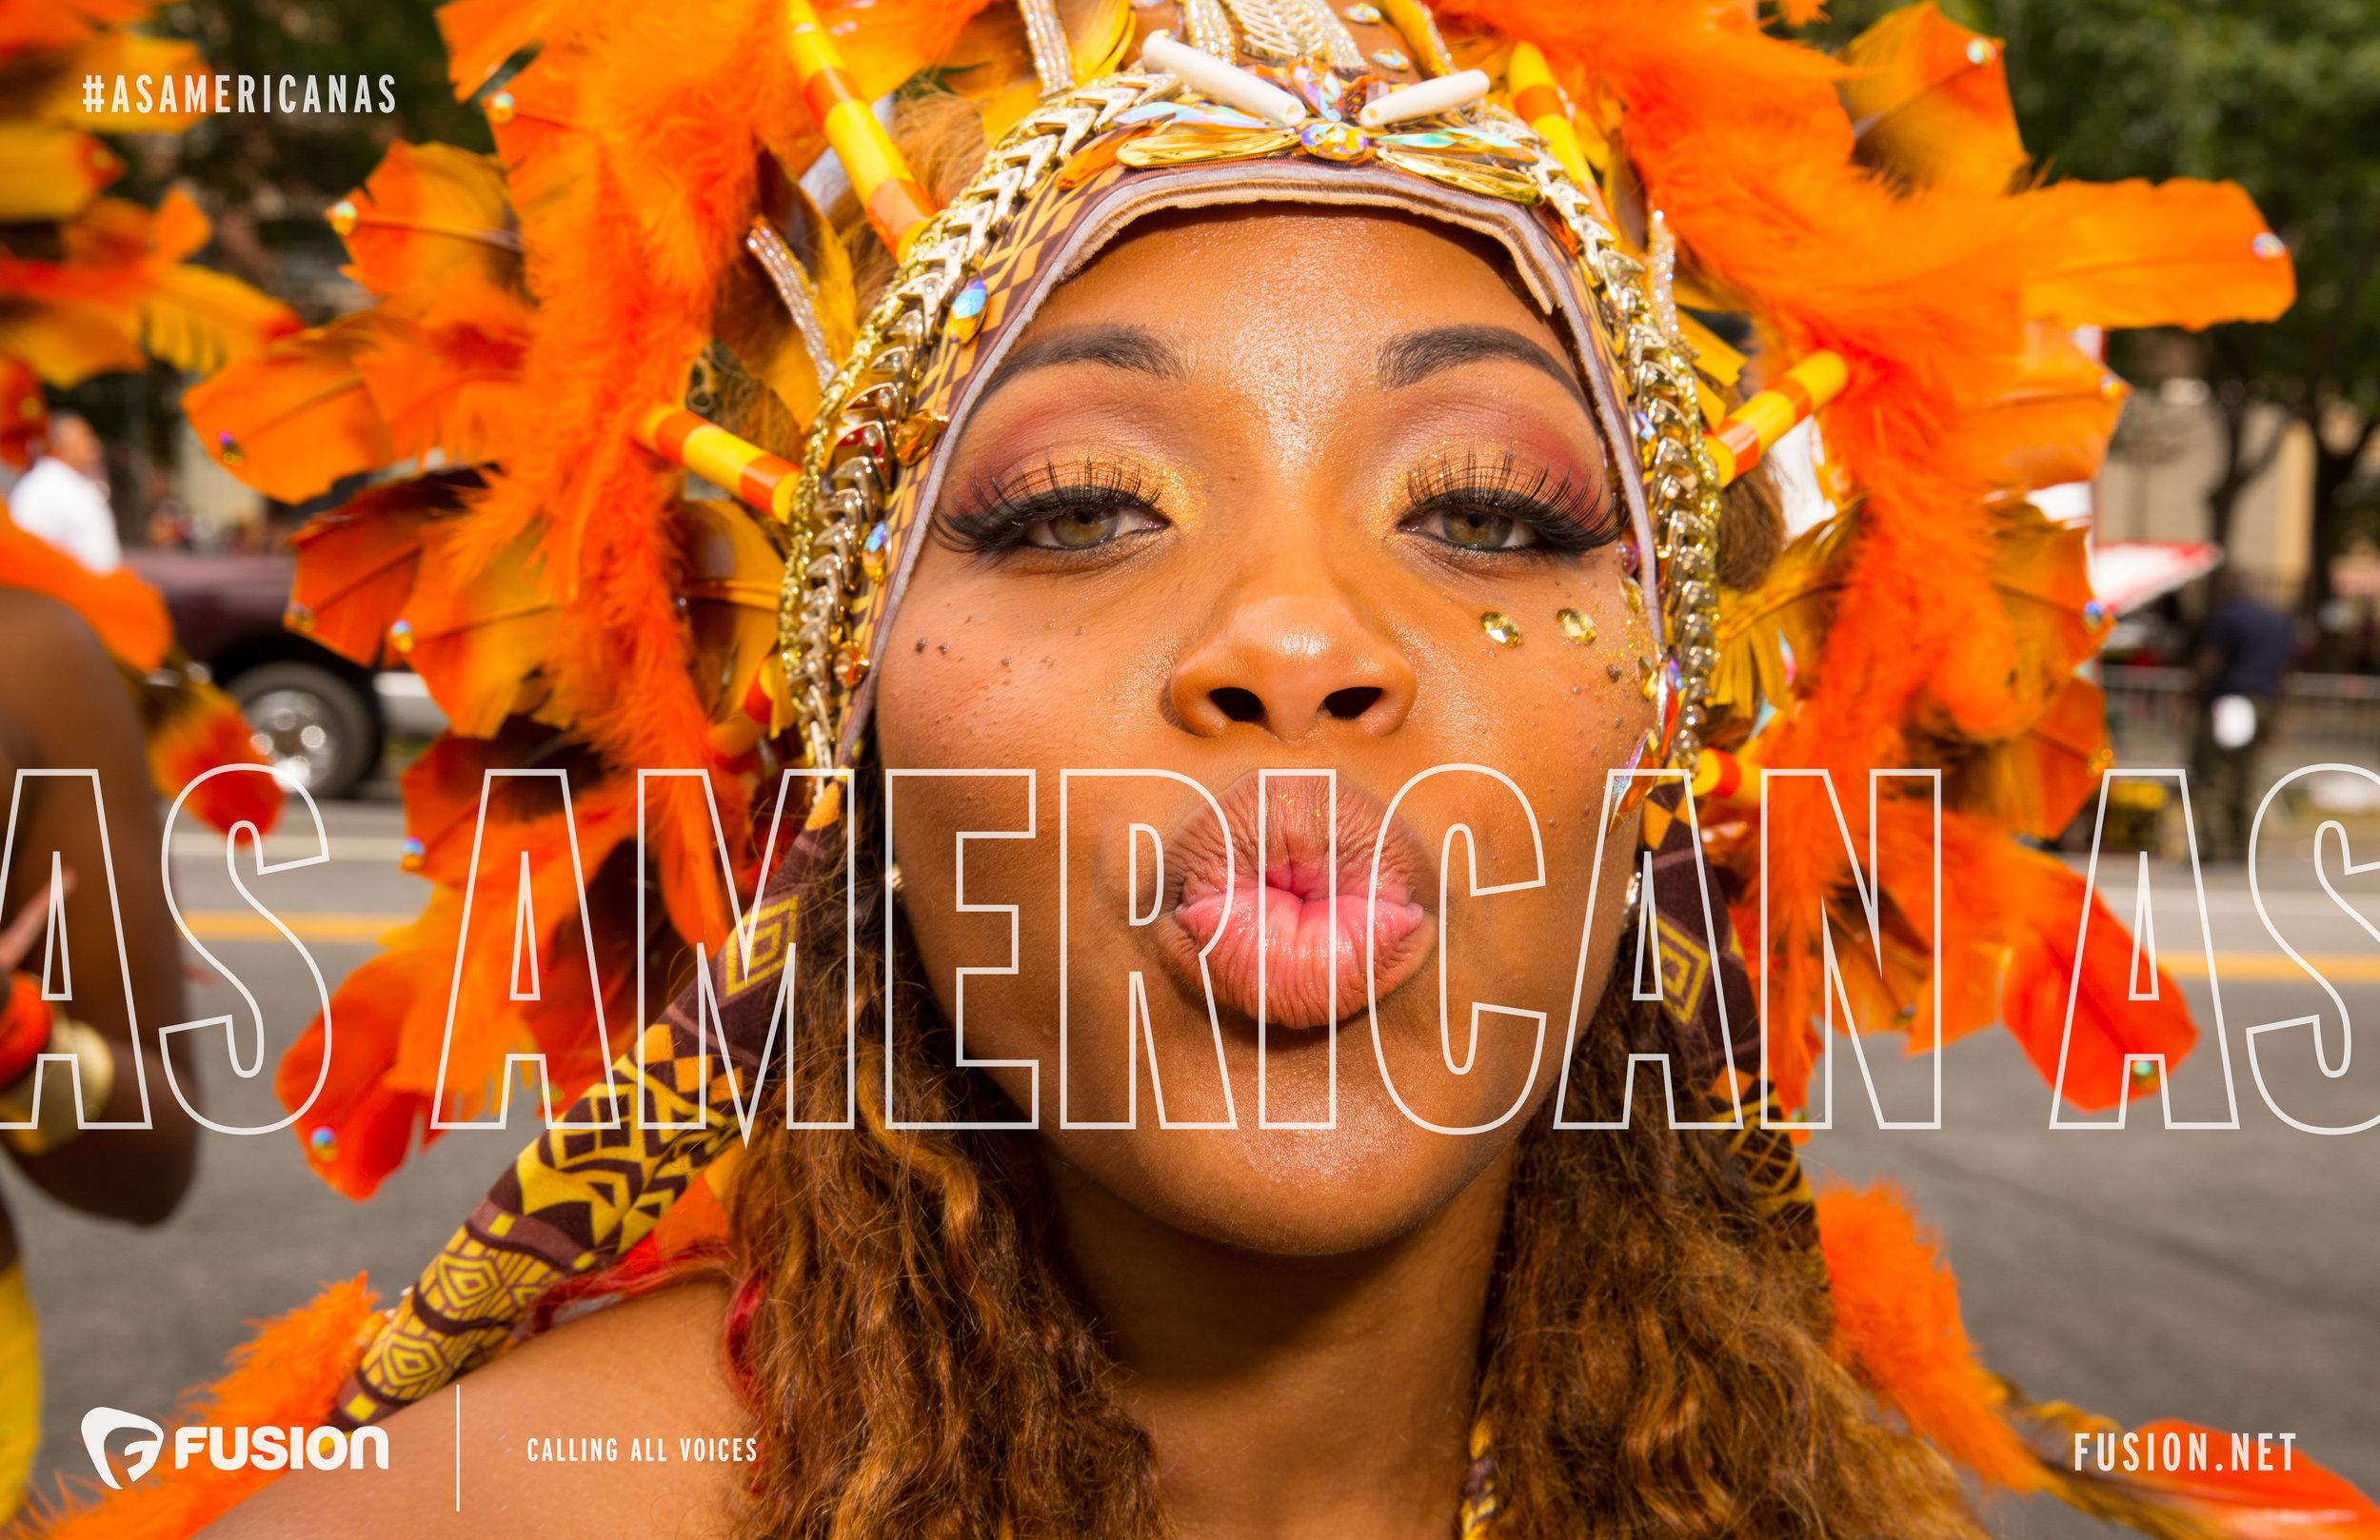 Fusion Campaign #AsAmericanAs